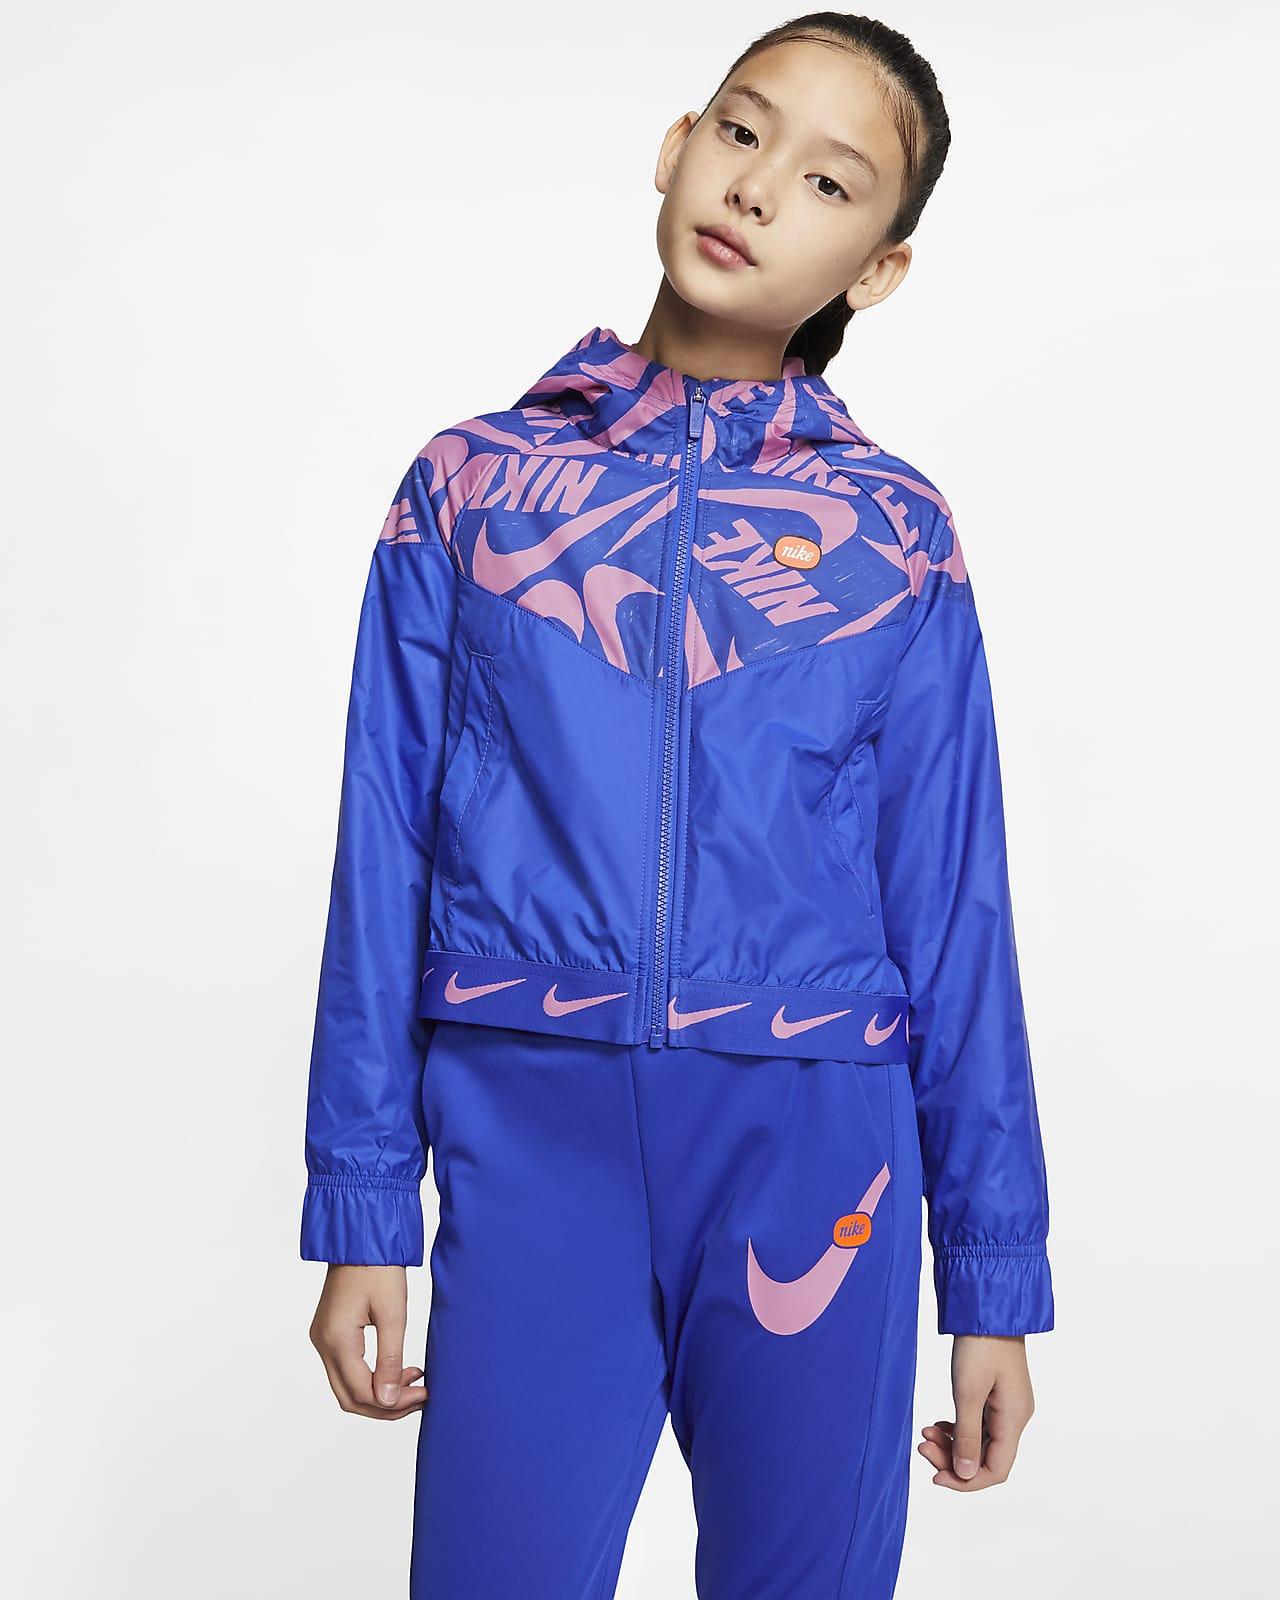 Nike Sportswear Windrunner 大童(女孩)夹克